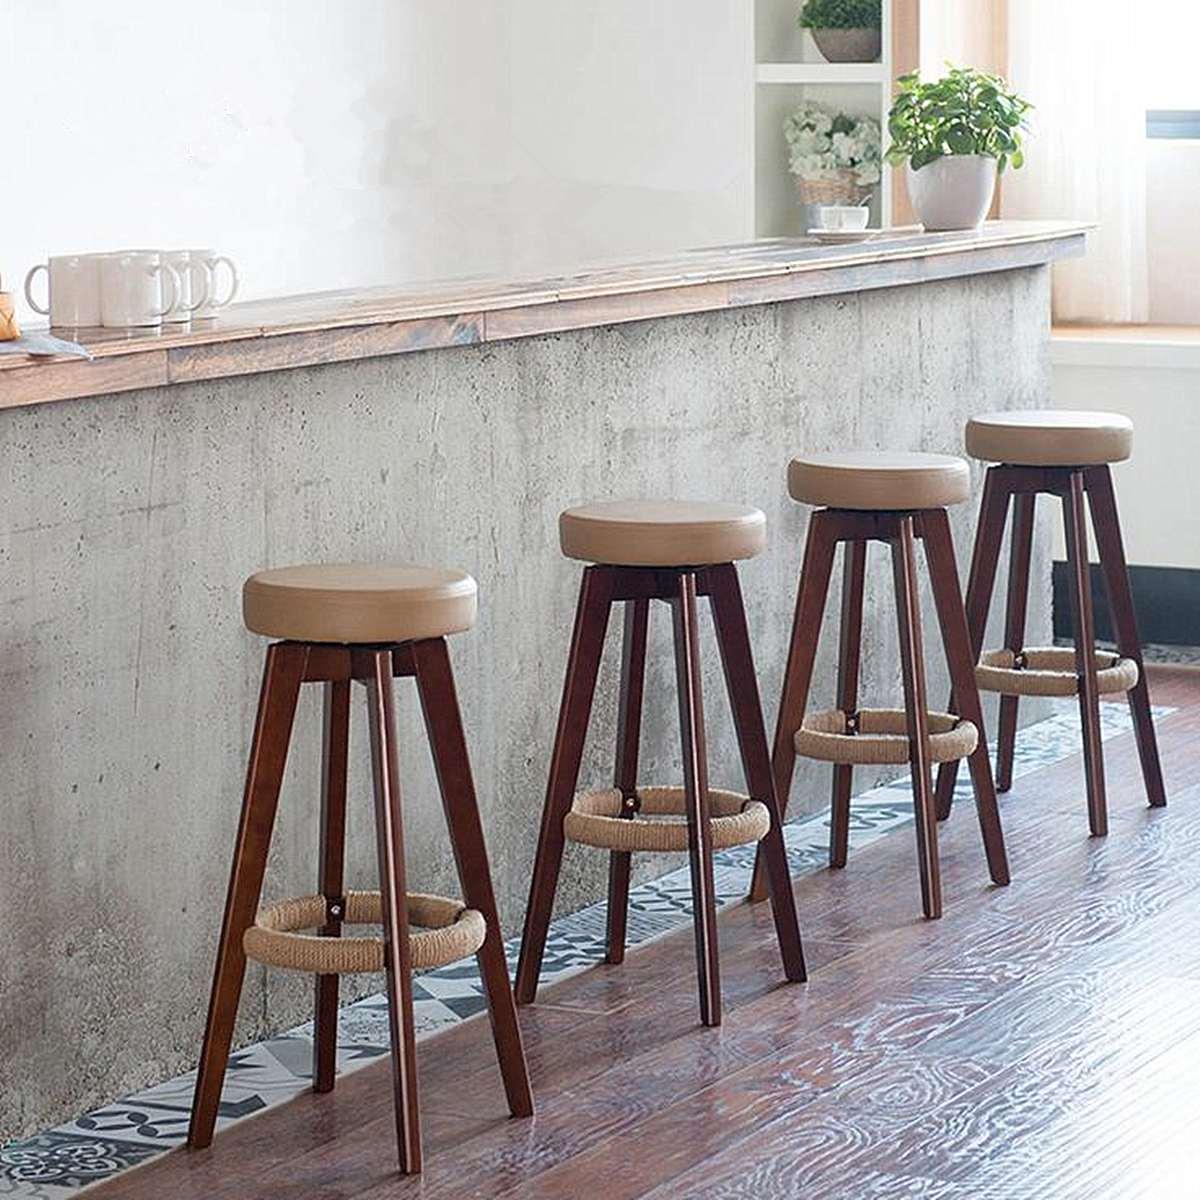 74cm Modern Dining Bar Stool Wooden Long Leg PU Chair Industrial Swivel Seat Cafe Restaurant Stool Home Bar Furniture 3 Colors